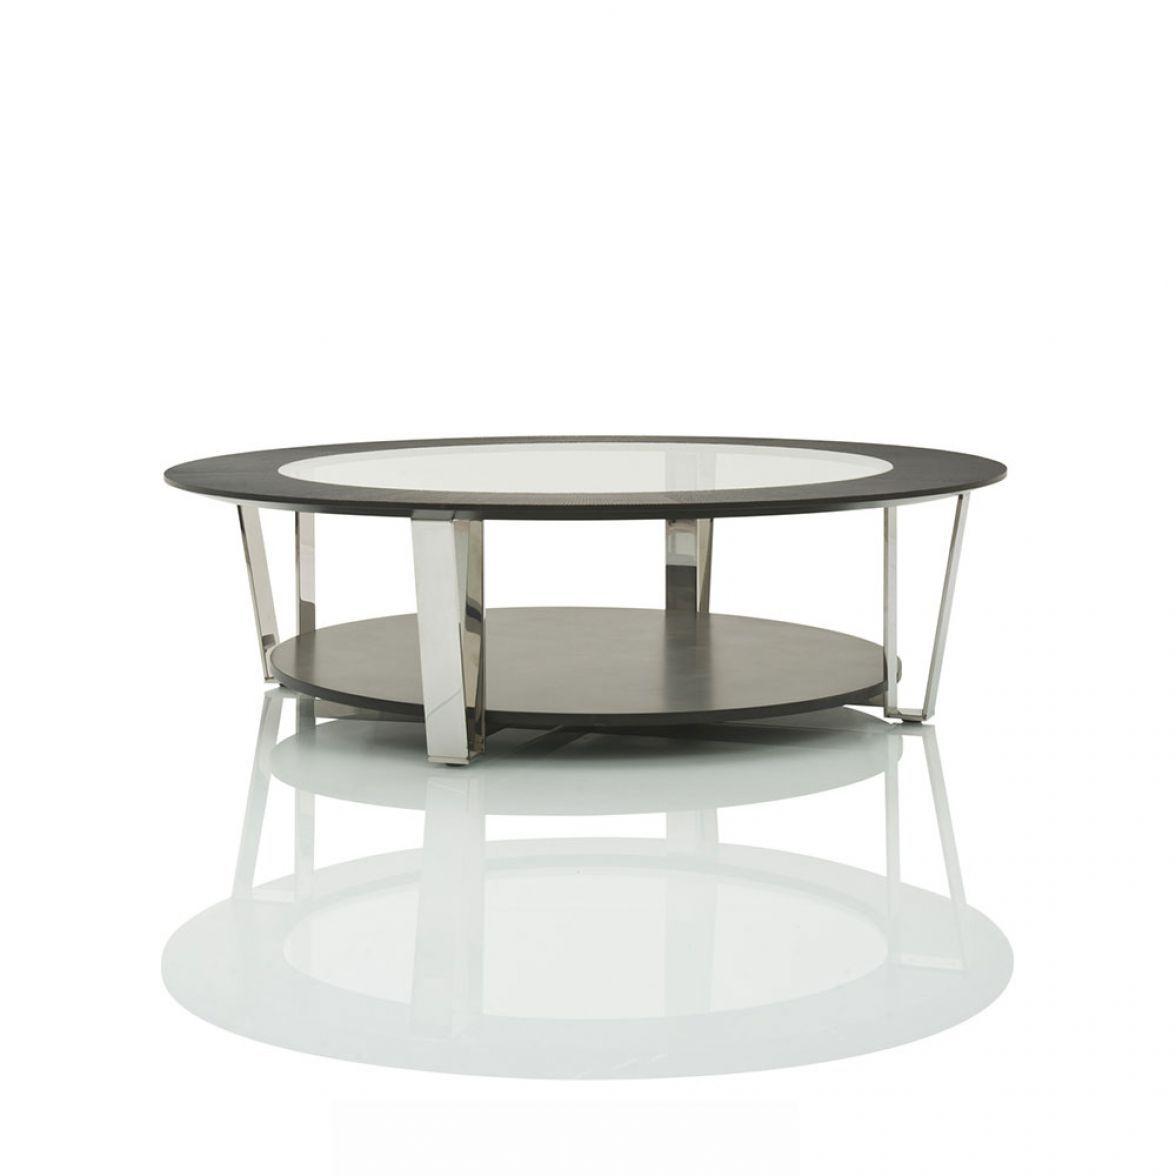 Zodiac coffee table фото цена